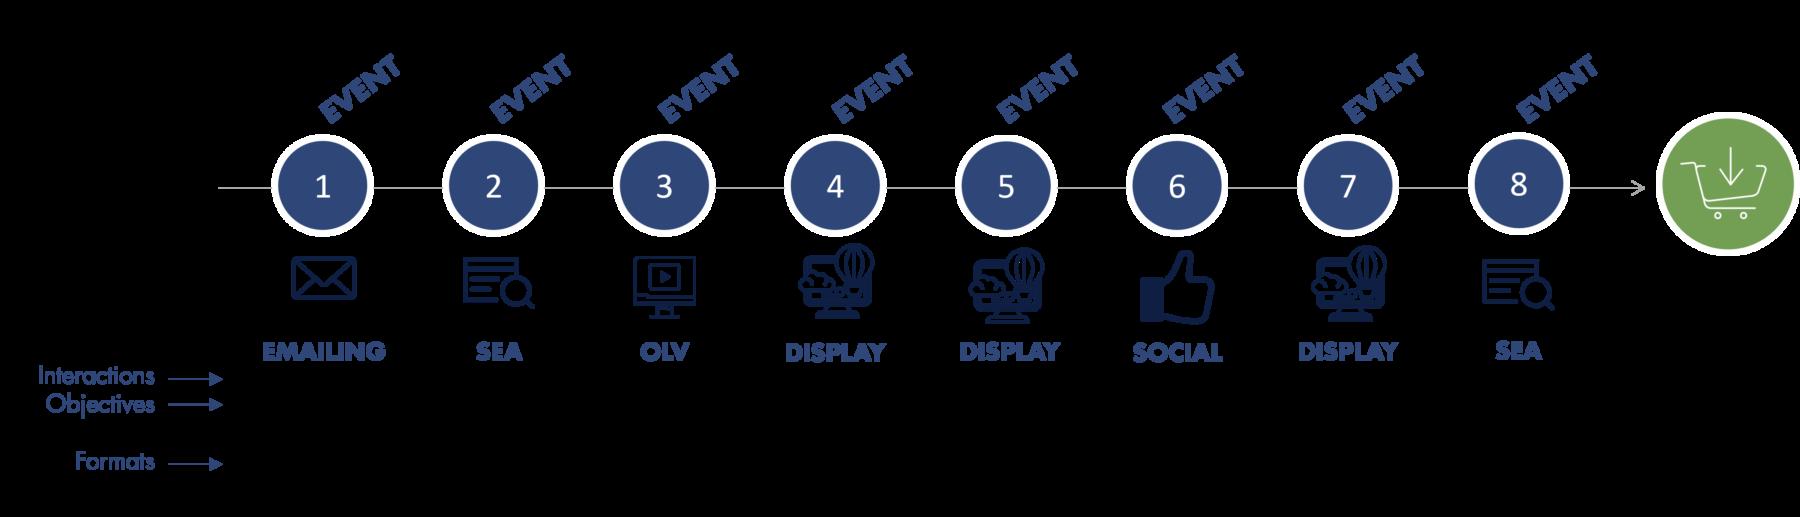 marketing tools - conversion path